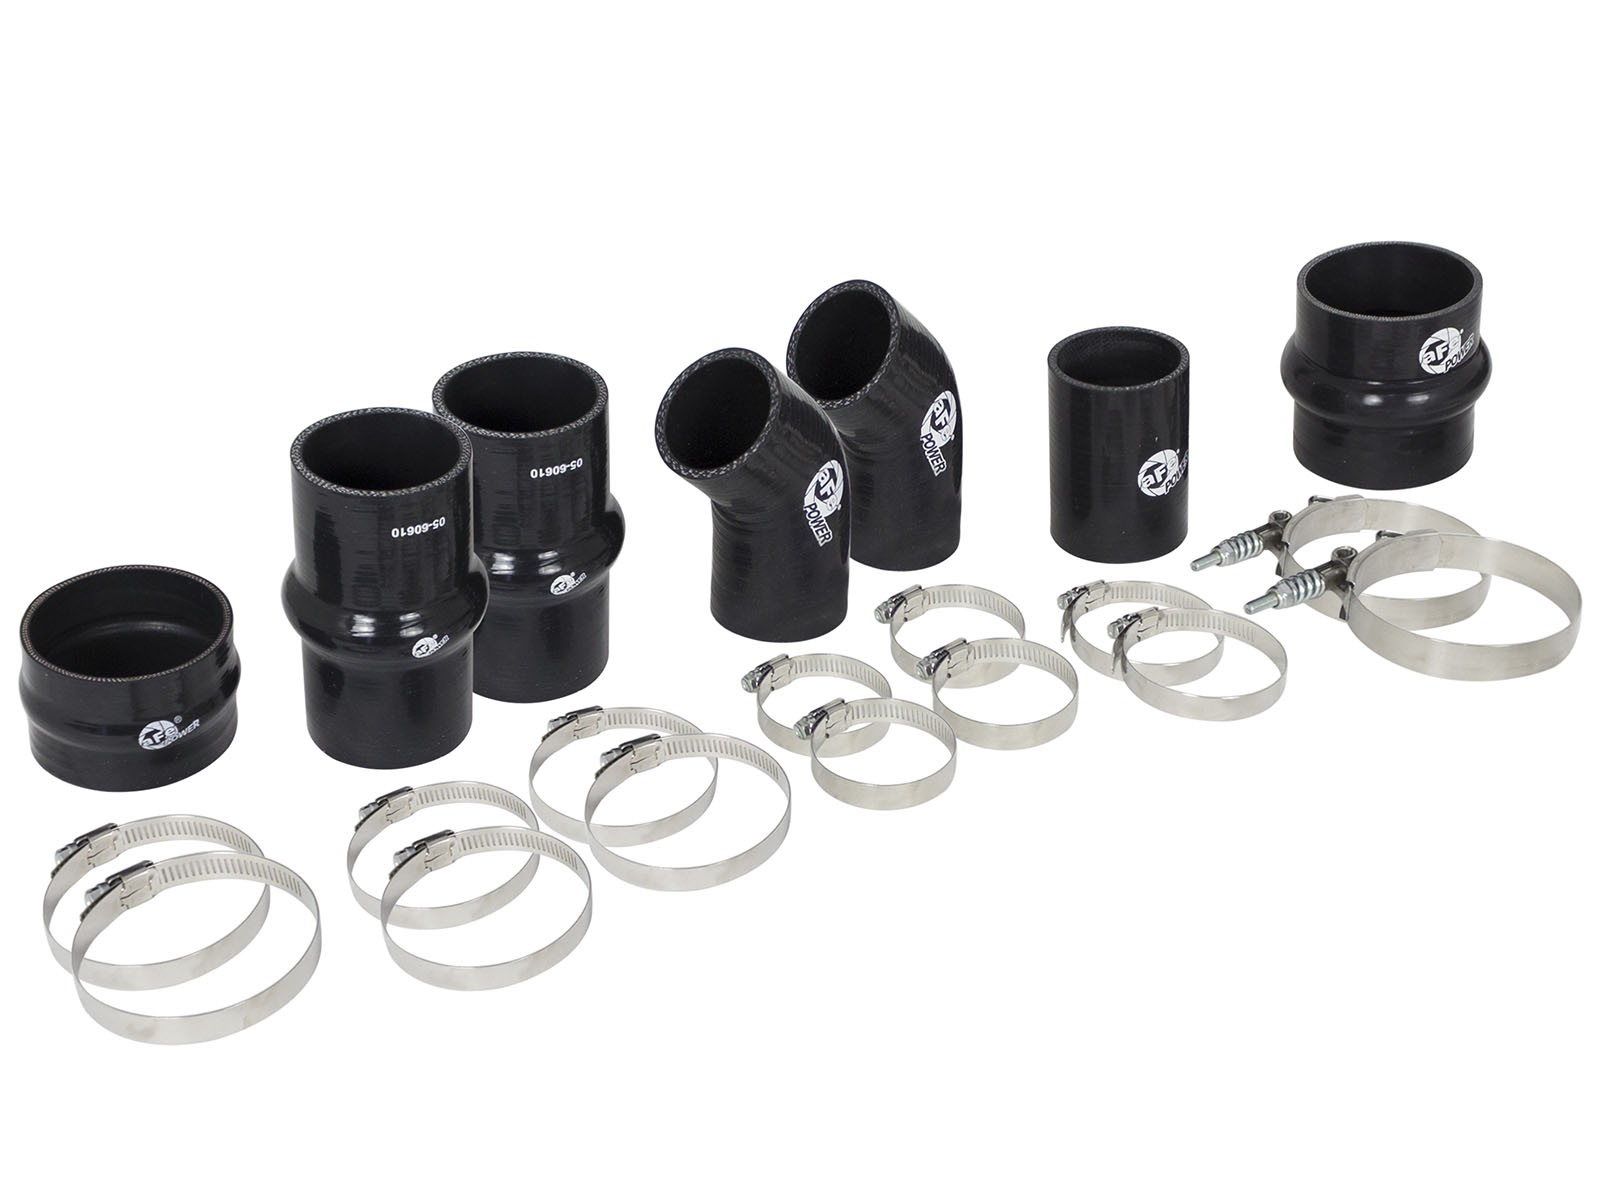 aFe POWER 46-20120A BladeRunner Intercooler Couplings & Clamps Kit; aFe Tubes Only